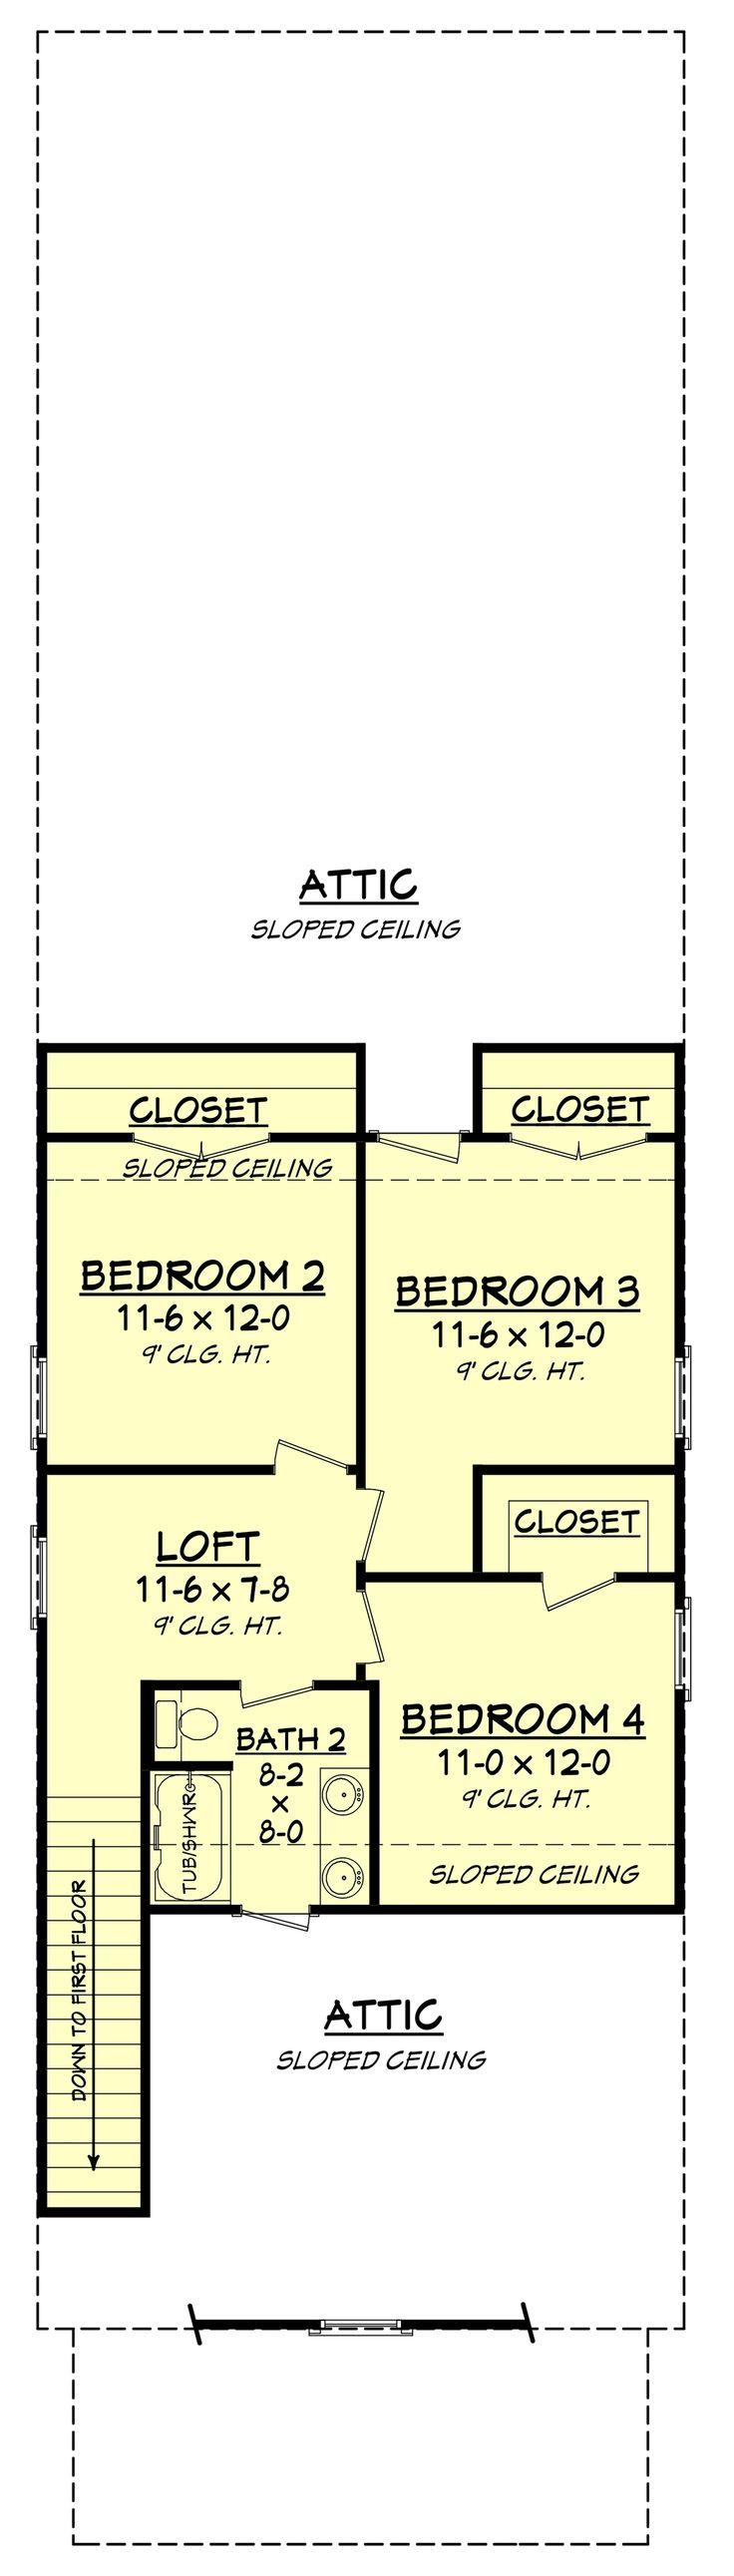 172 best house plans images on pinterest magnolia homes plan 430 117 houseplans com cool house planscottage style